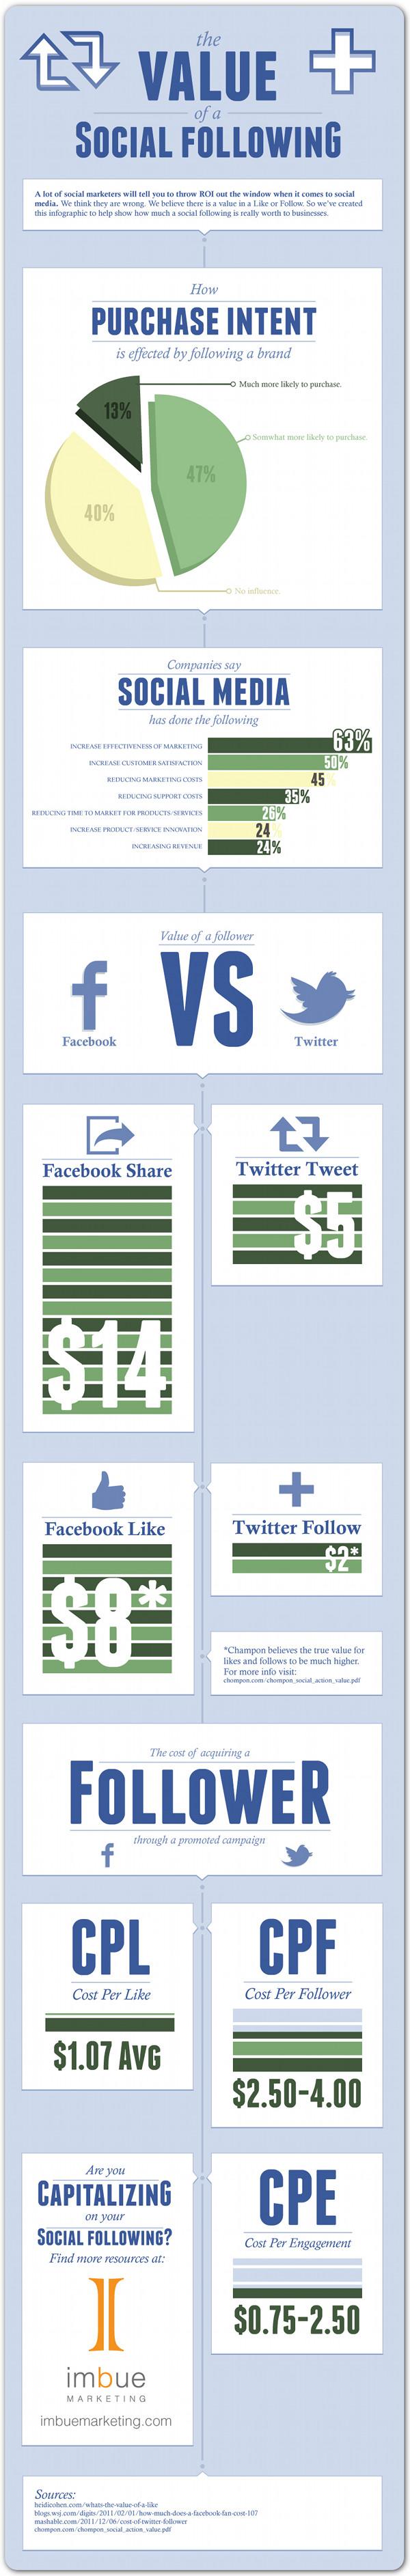 Facebook fans vs Twitter followers